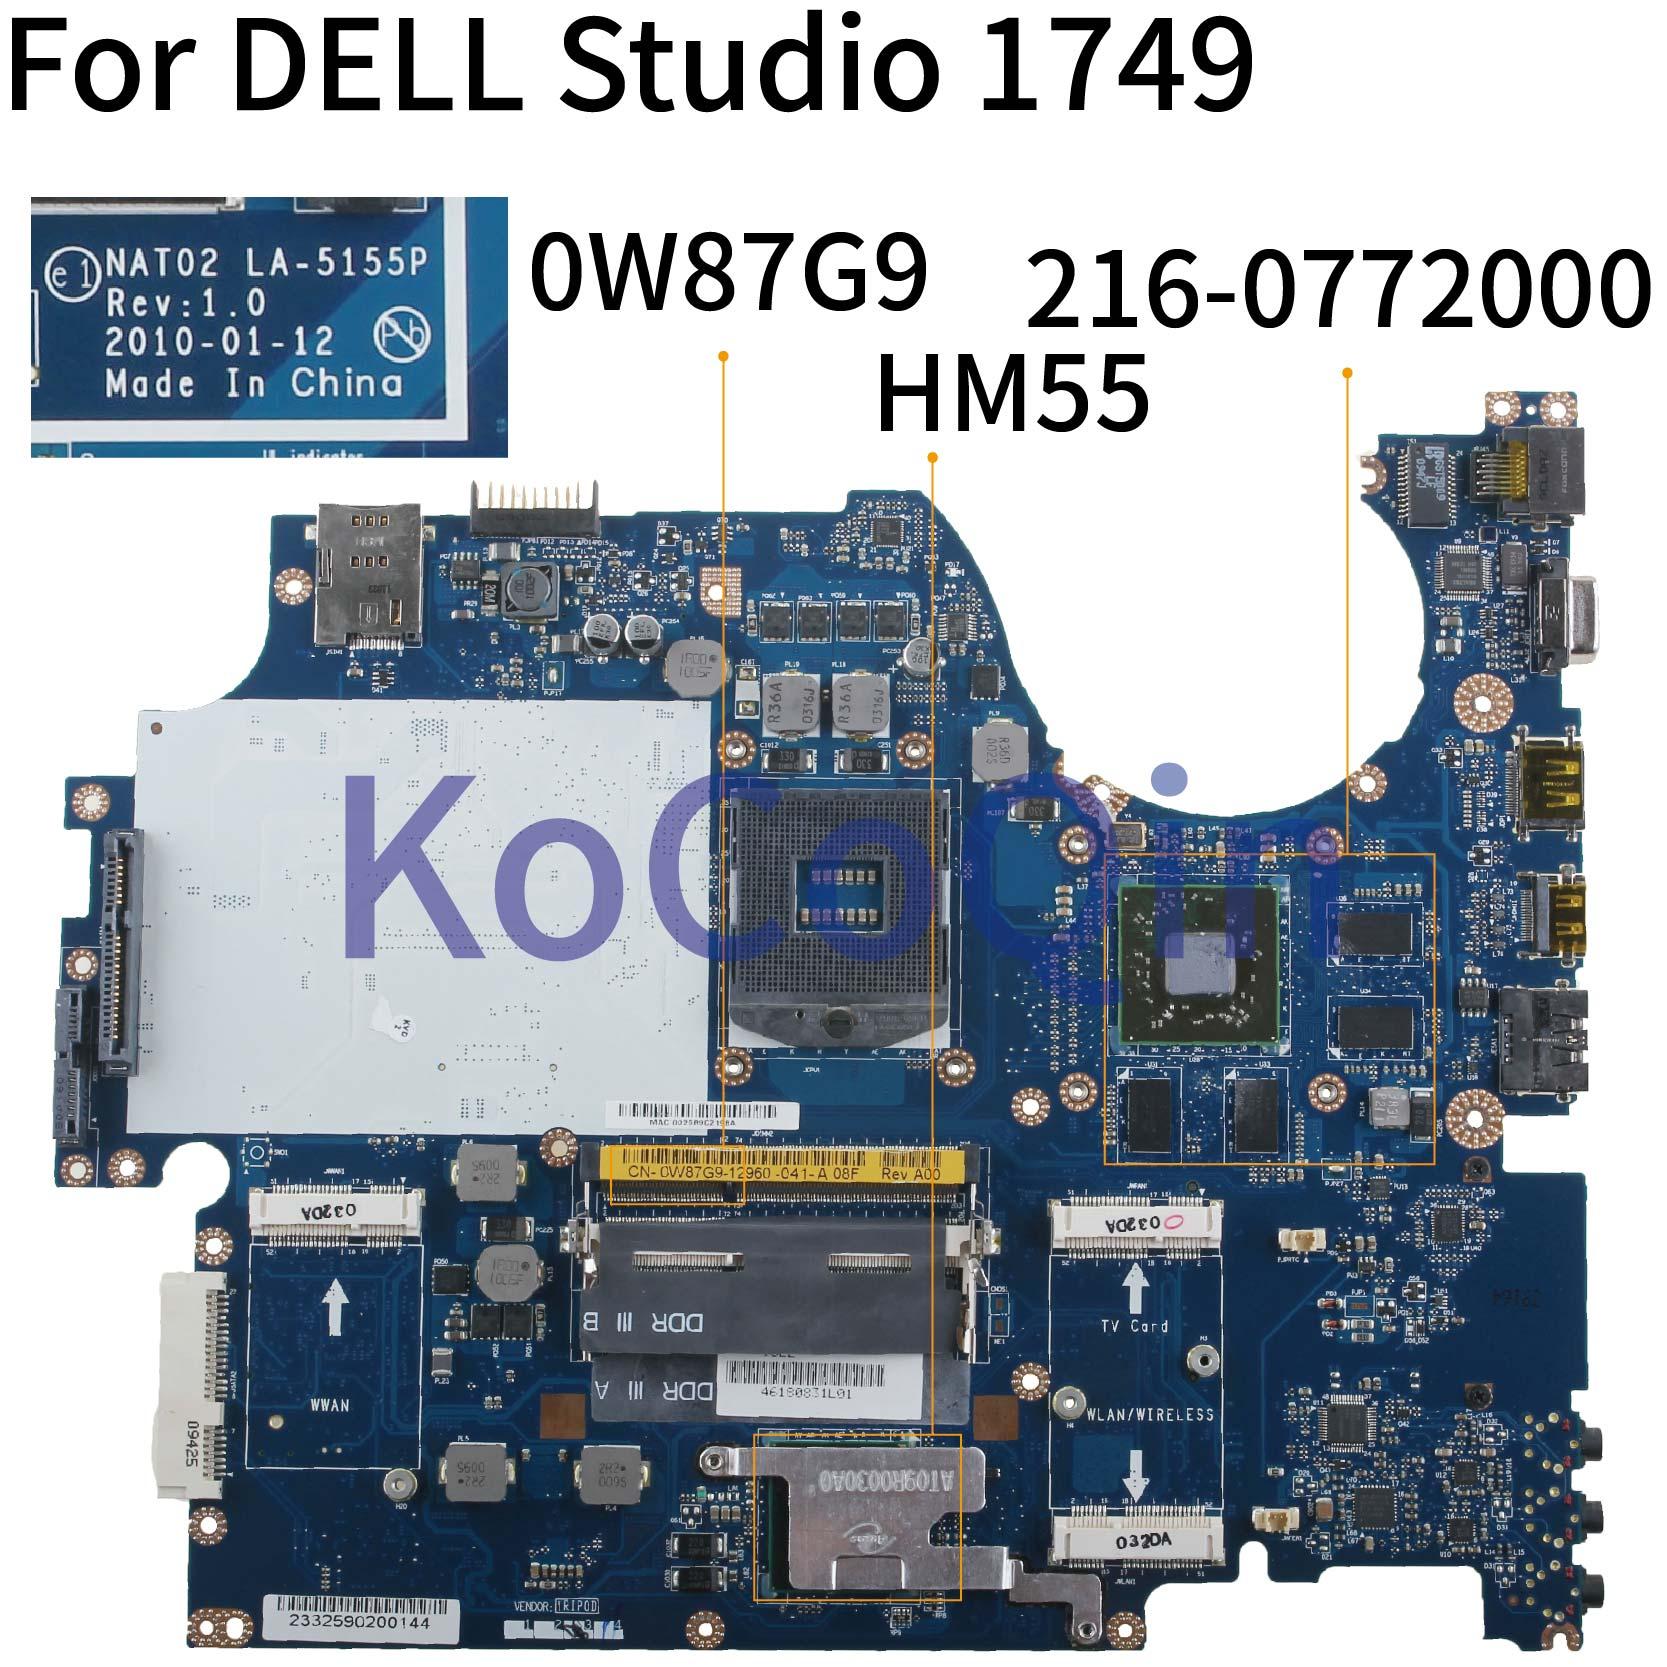 KoCoQin Laptop Motherboard For DELL Studio 1749 Mainboard CN-0W87G9 0W87G9 NAT02 LA-5155P 216-0772000 HM55